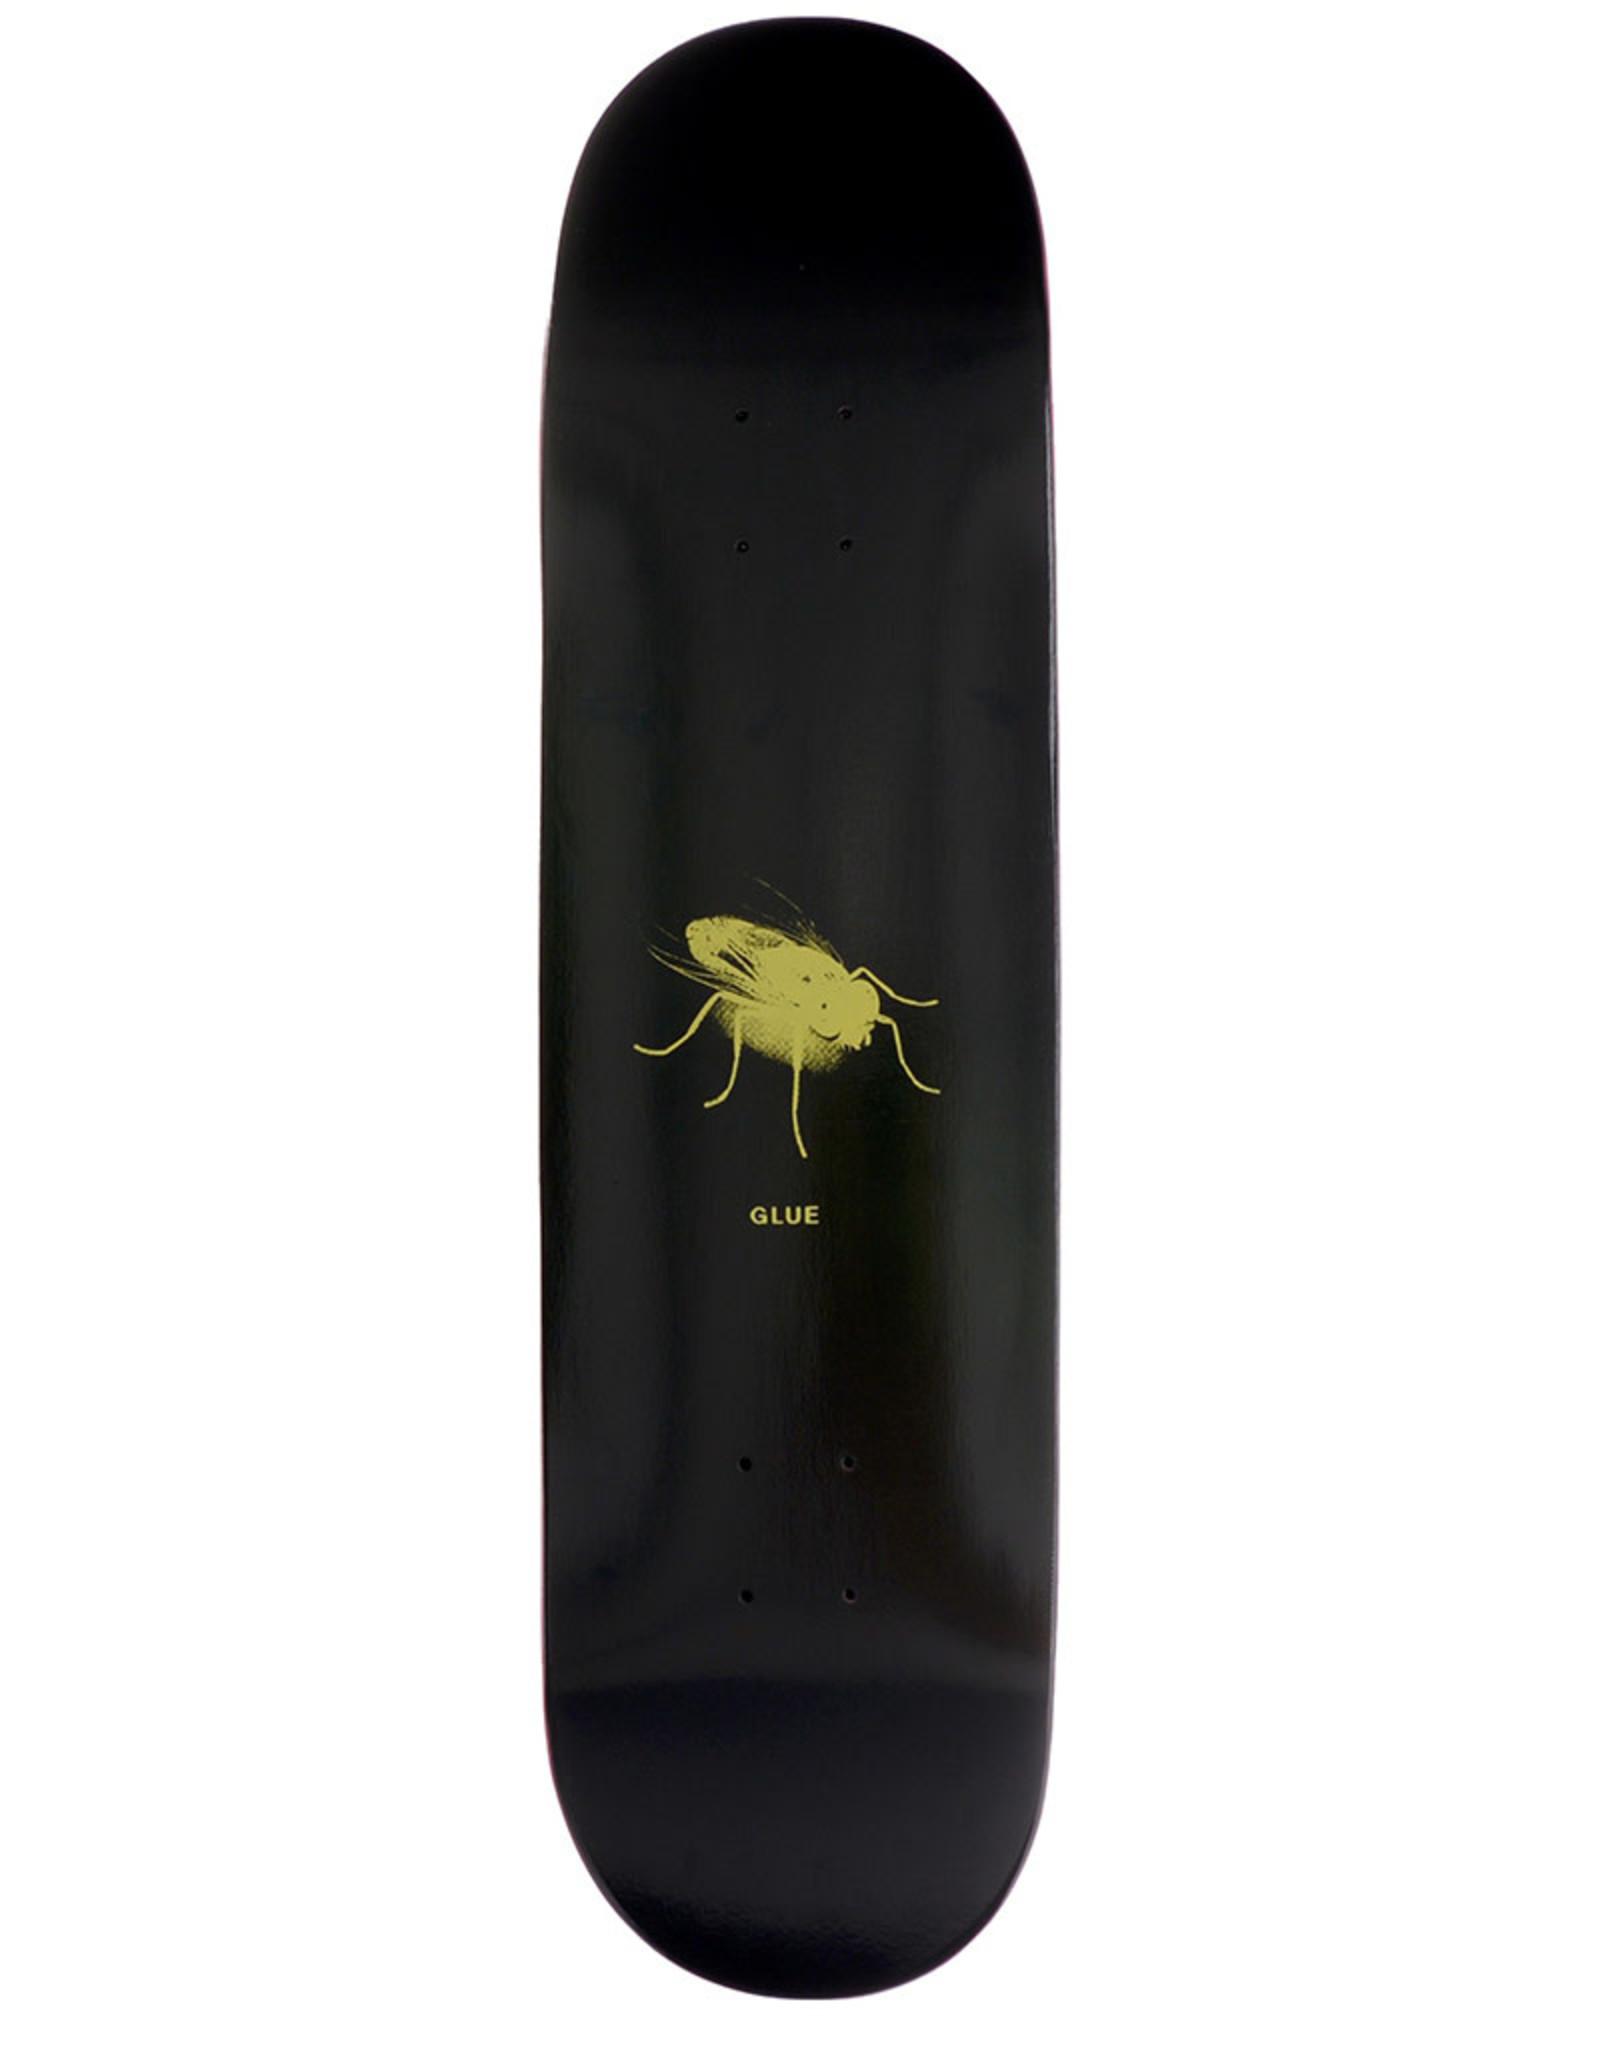 Glue Skateboards Glue Deck Team Fly Yellow (8.25)